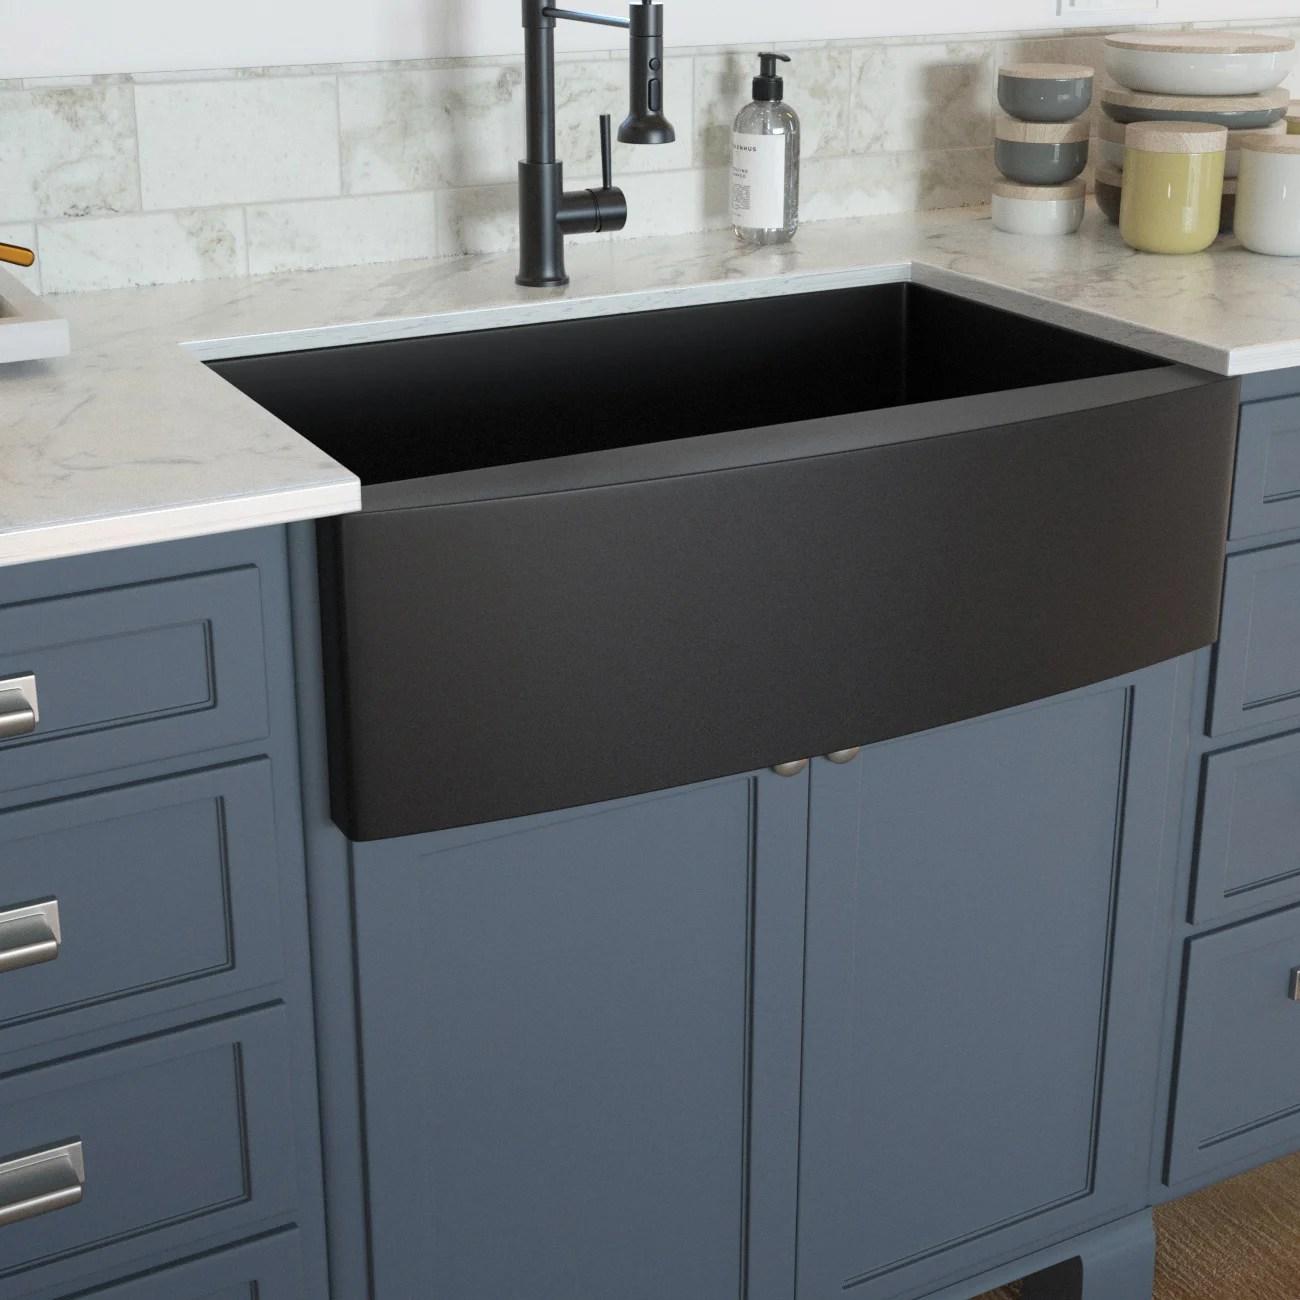 30 inch farmhouse kitchen sink gunmetal black apron front 16 gauge stainless steel deep single bowl kitchen farm sinks